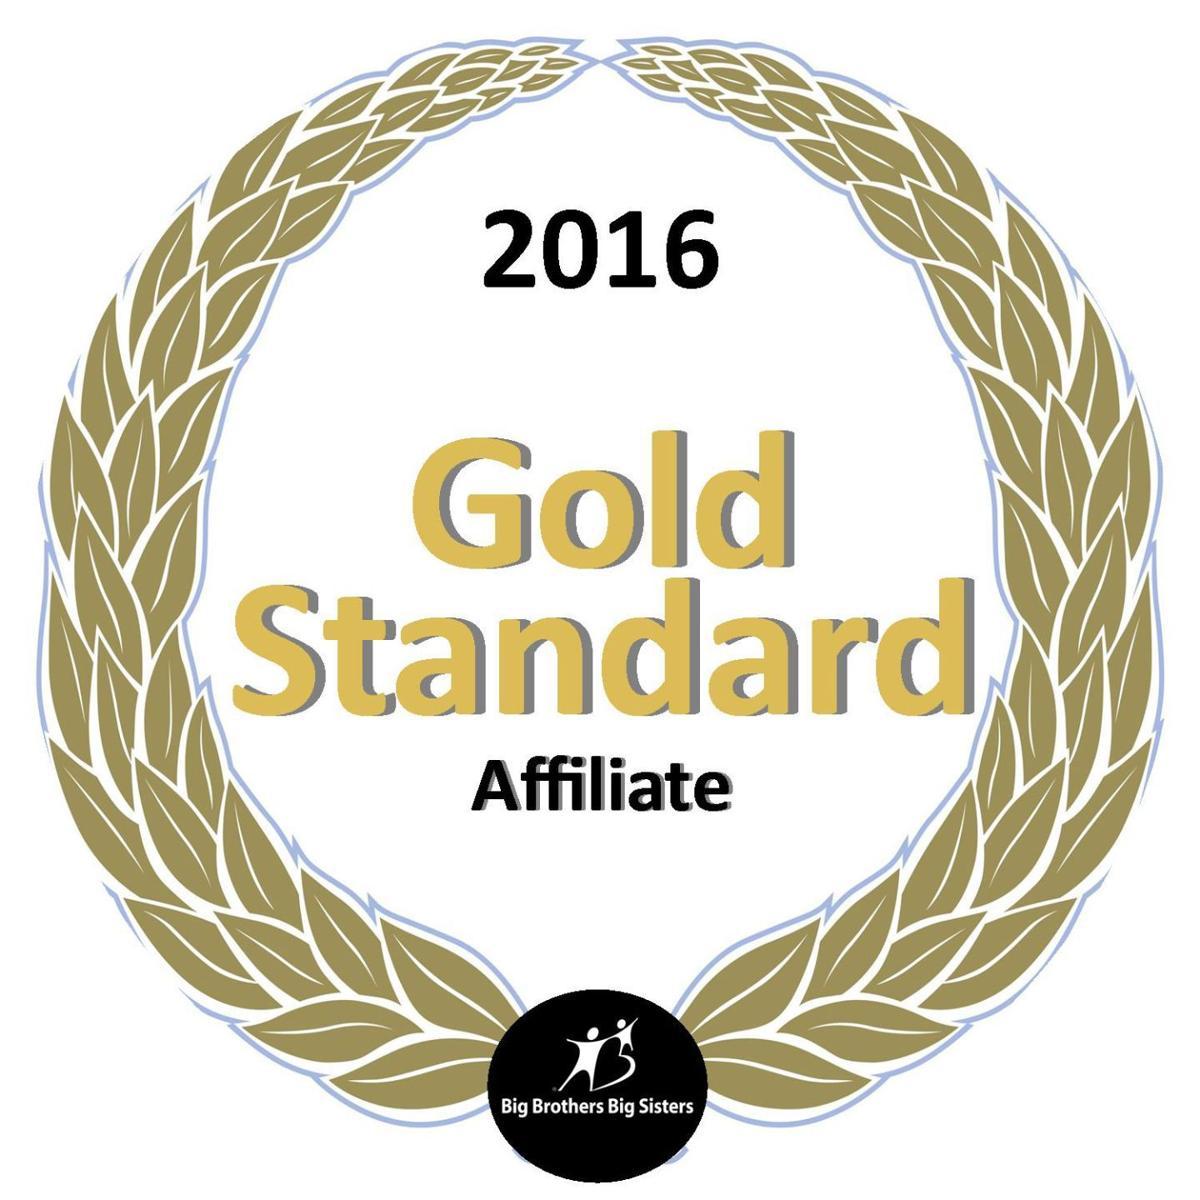 Big Brothers Big Sisters Gold Standard designation